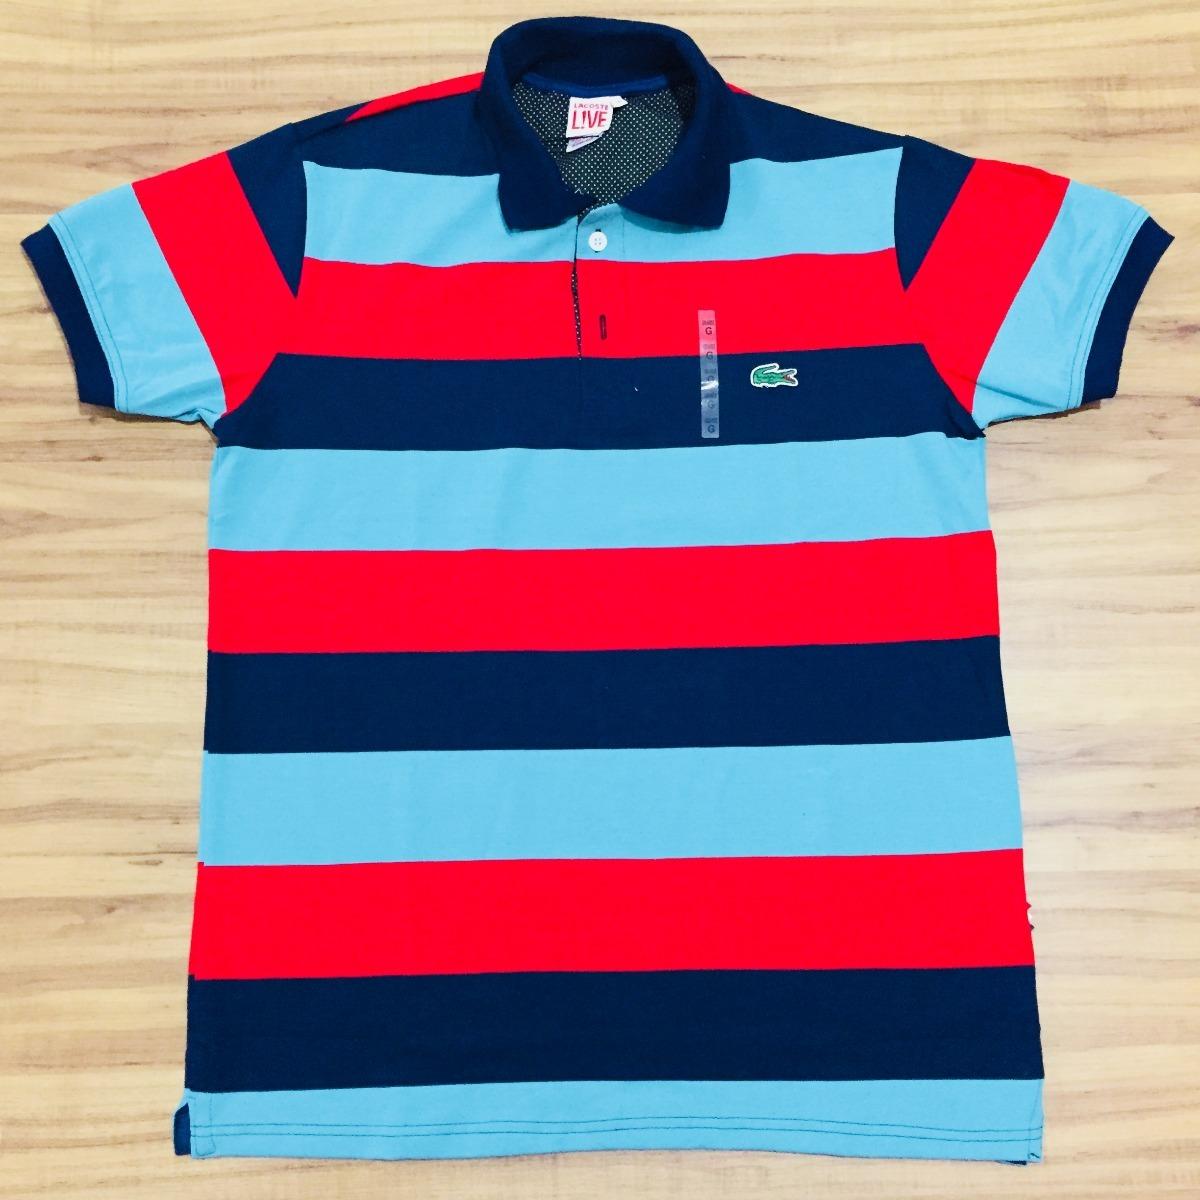 619ef4e8f25 Camisa Polo Lacoste Original Lcst Live Peruana Slim Fit - R  89